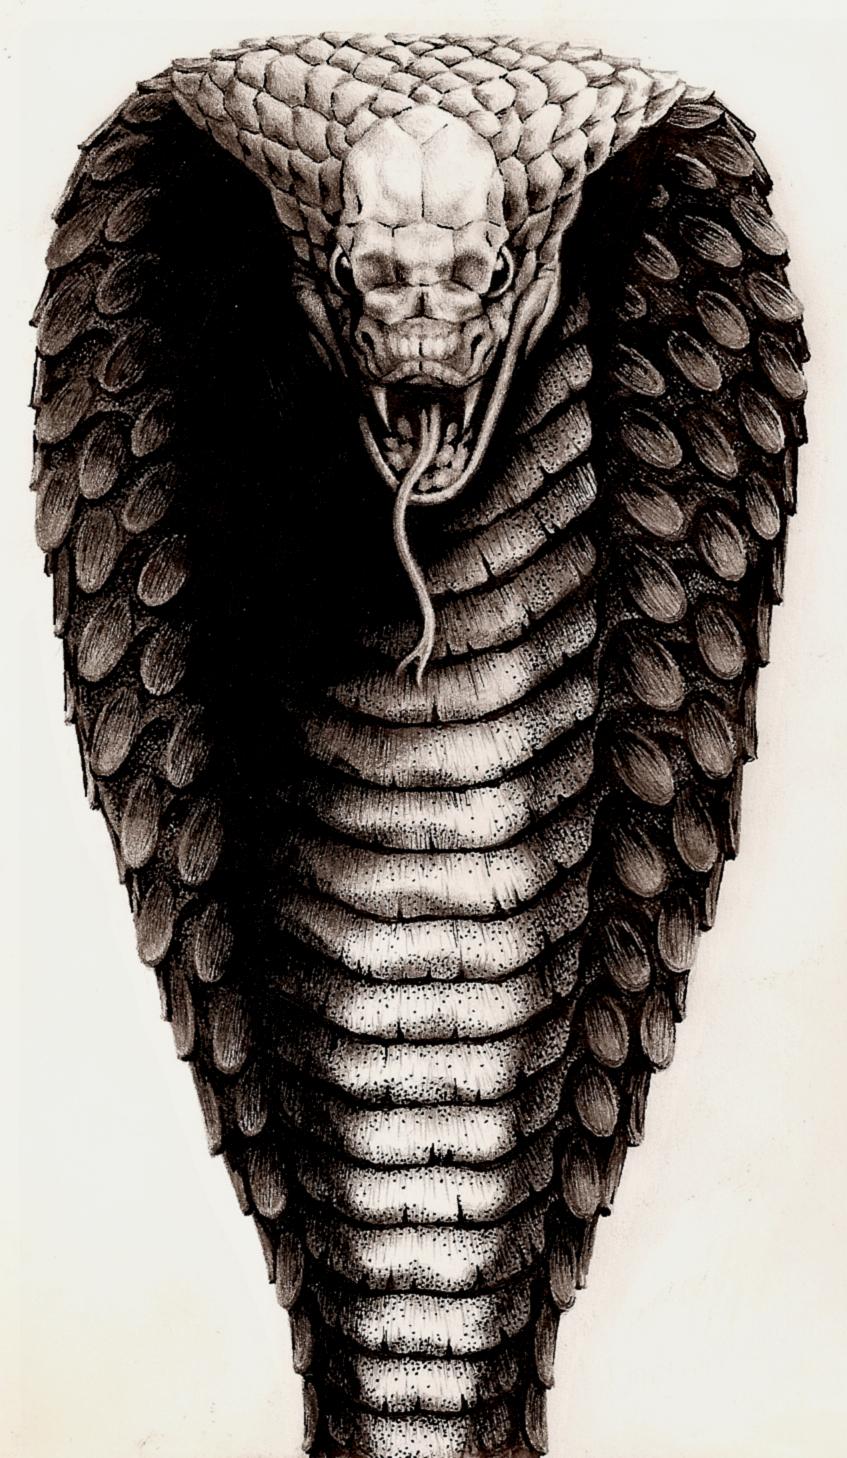 847x1458 King Cobra By Aka Maelstrom